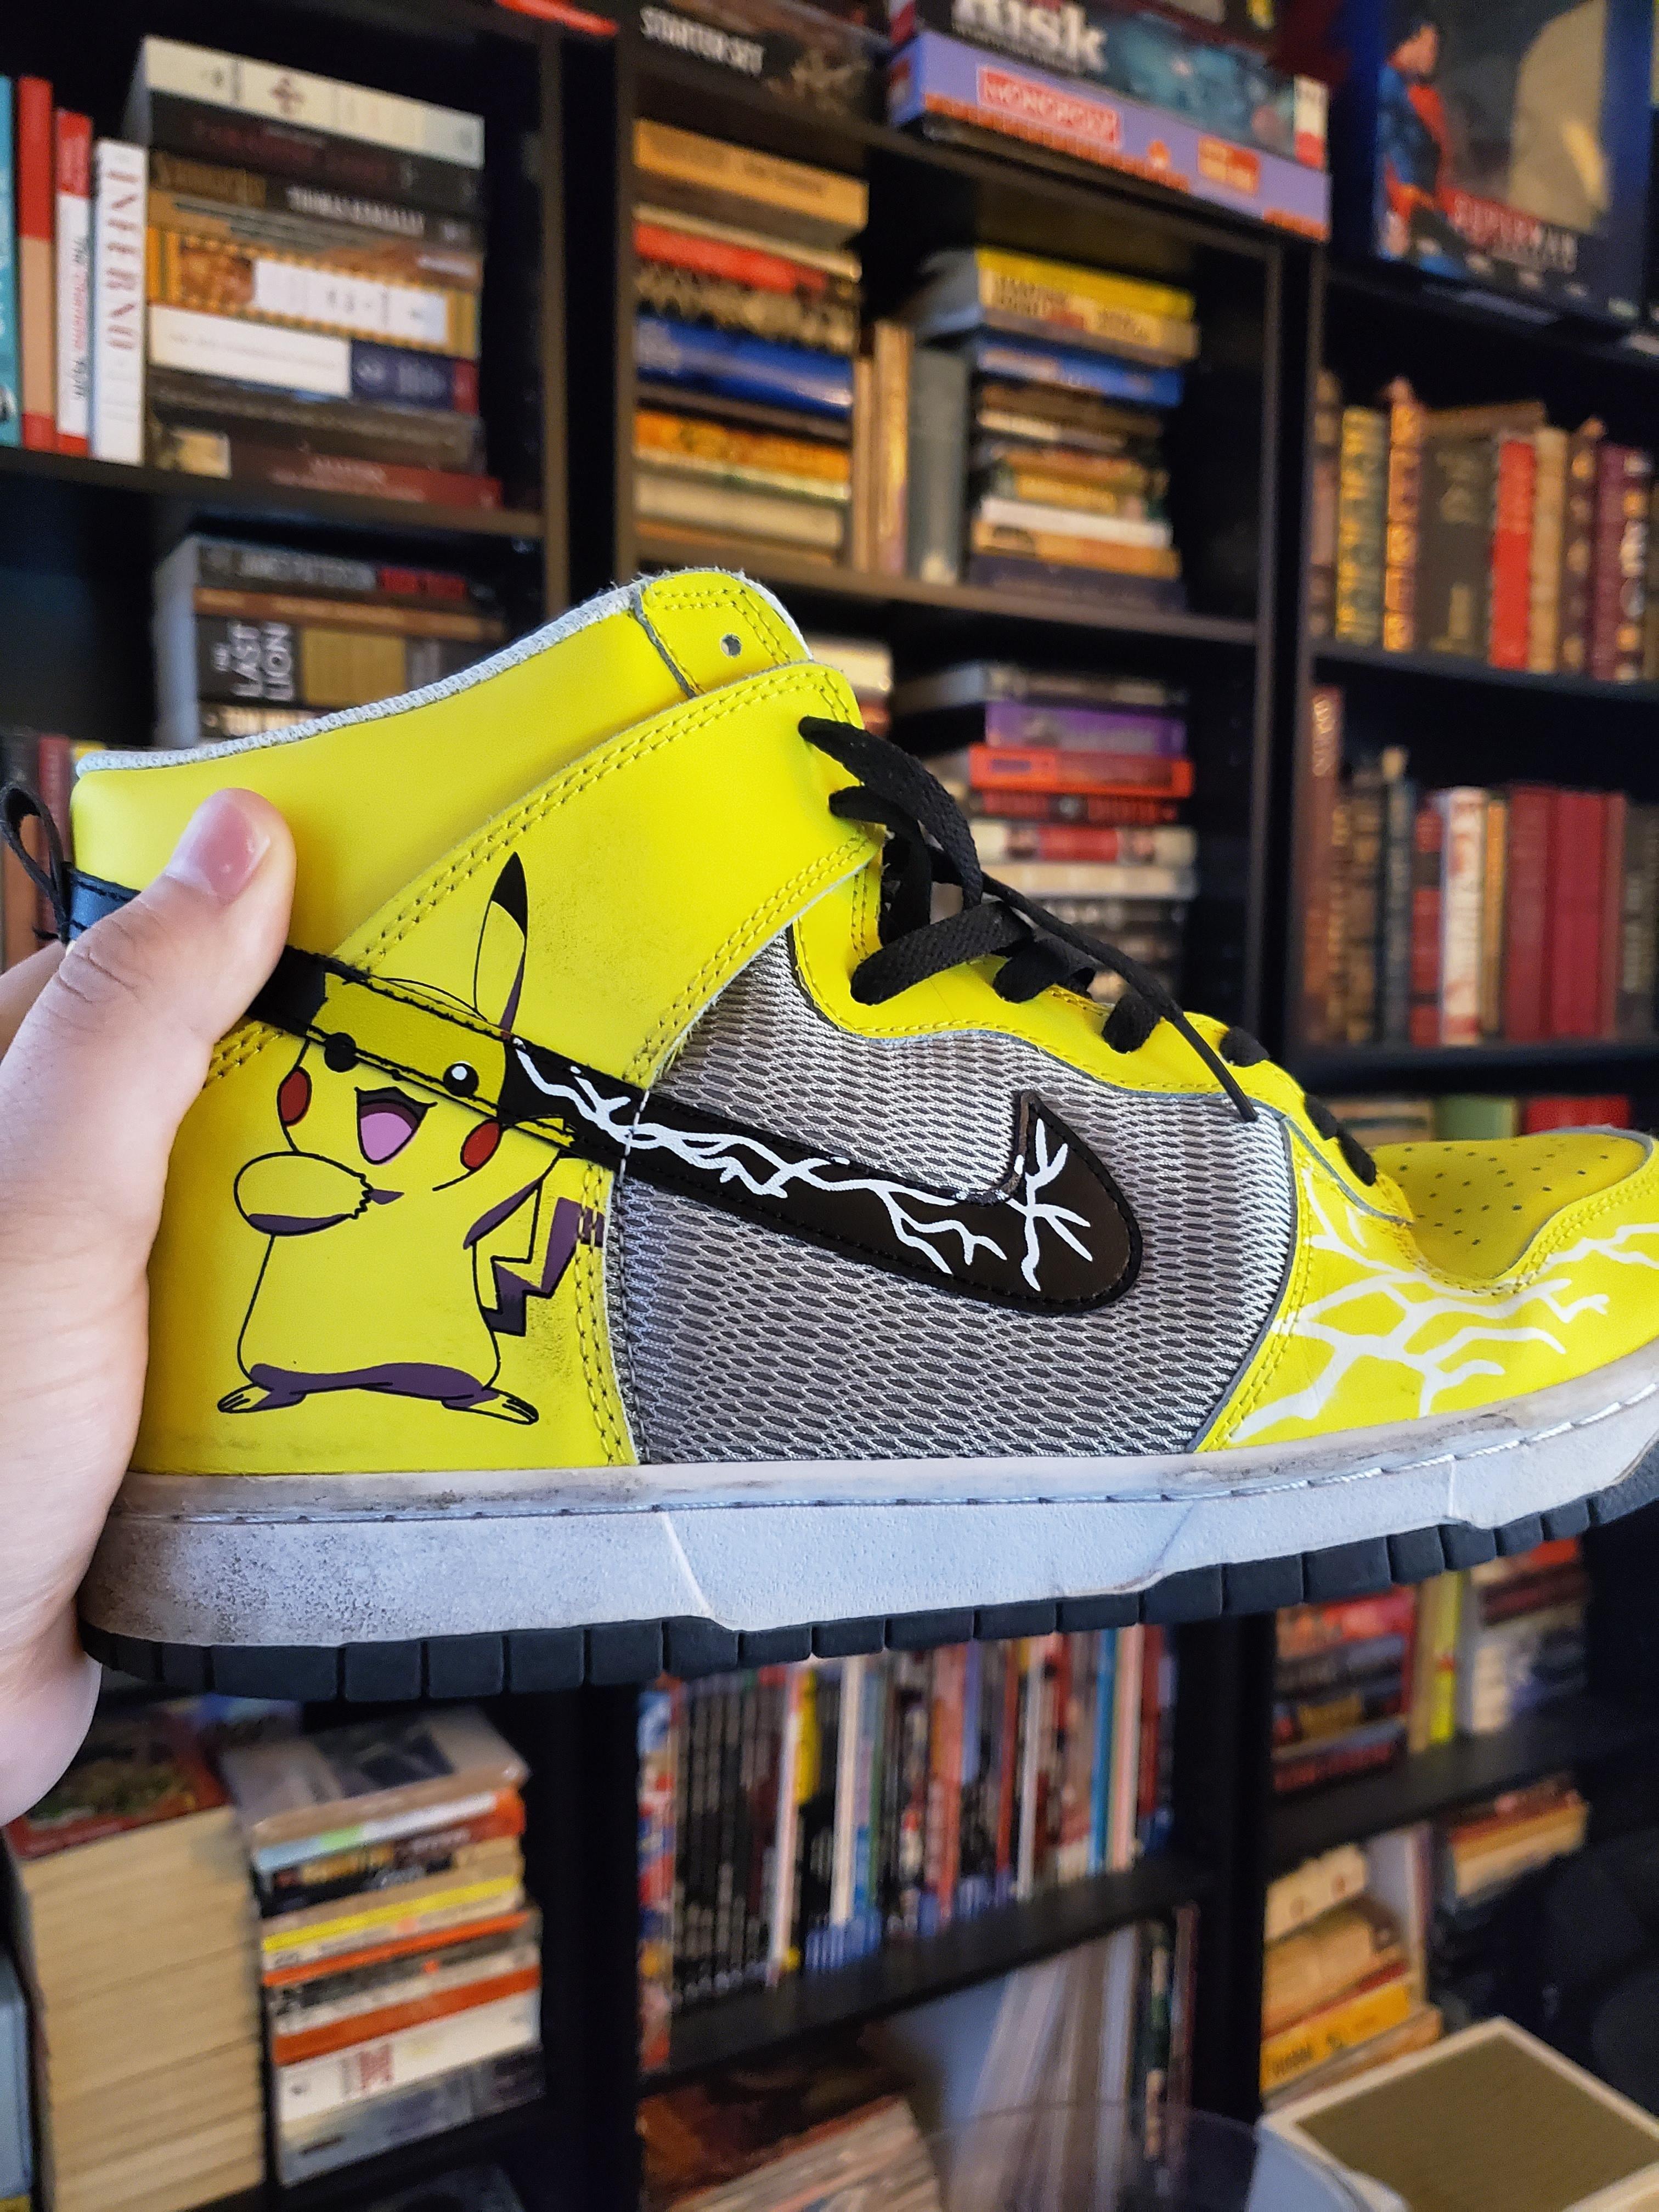 Eclipse solar interior sensación  About to represent in the theater when I go see Detective Pikachu! | Adidas  stan smith, Adidas stan, Adidas sneakers